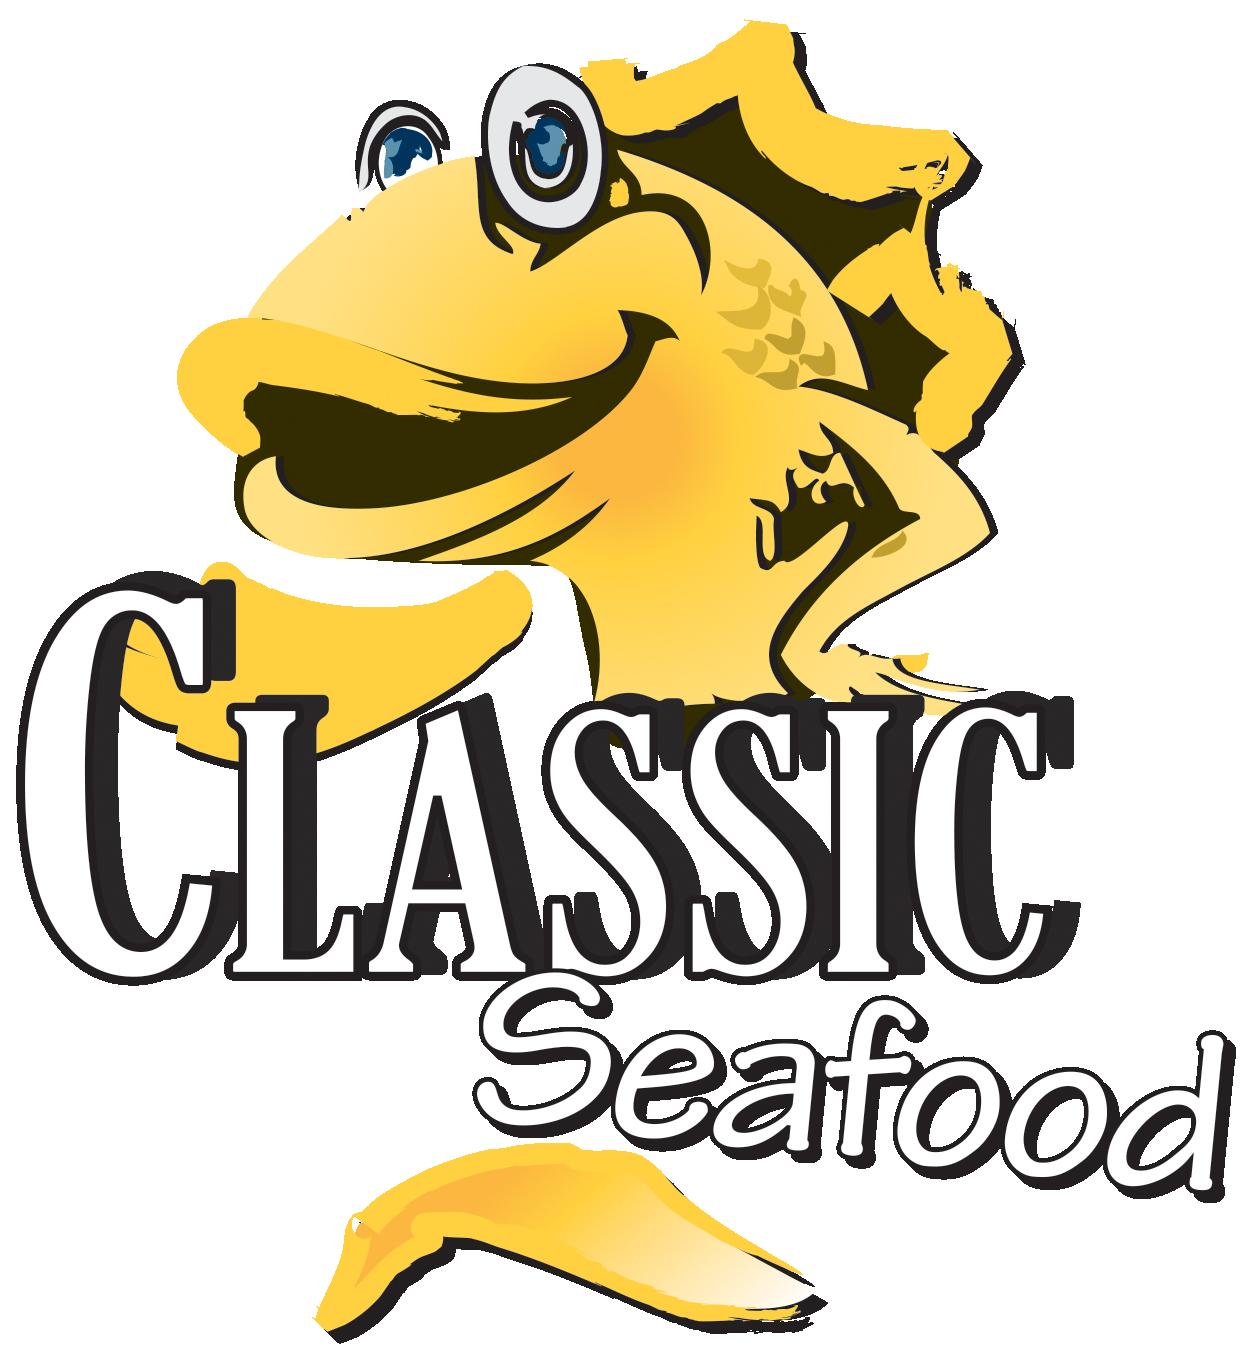 Shellfish classic seafood market. Clipart lake frozen lake